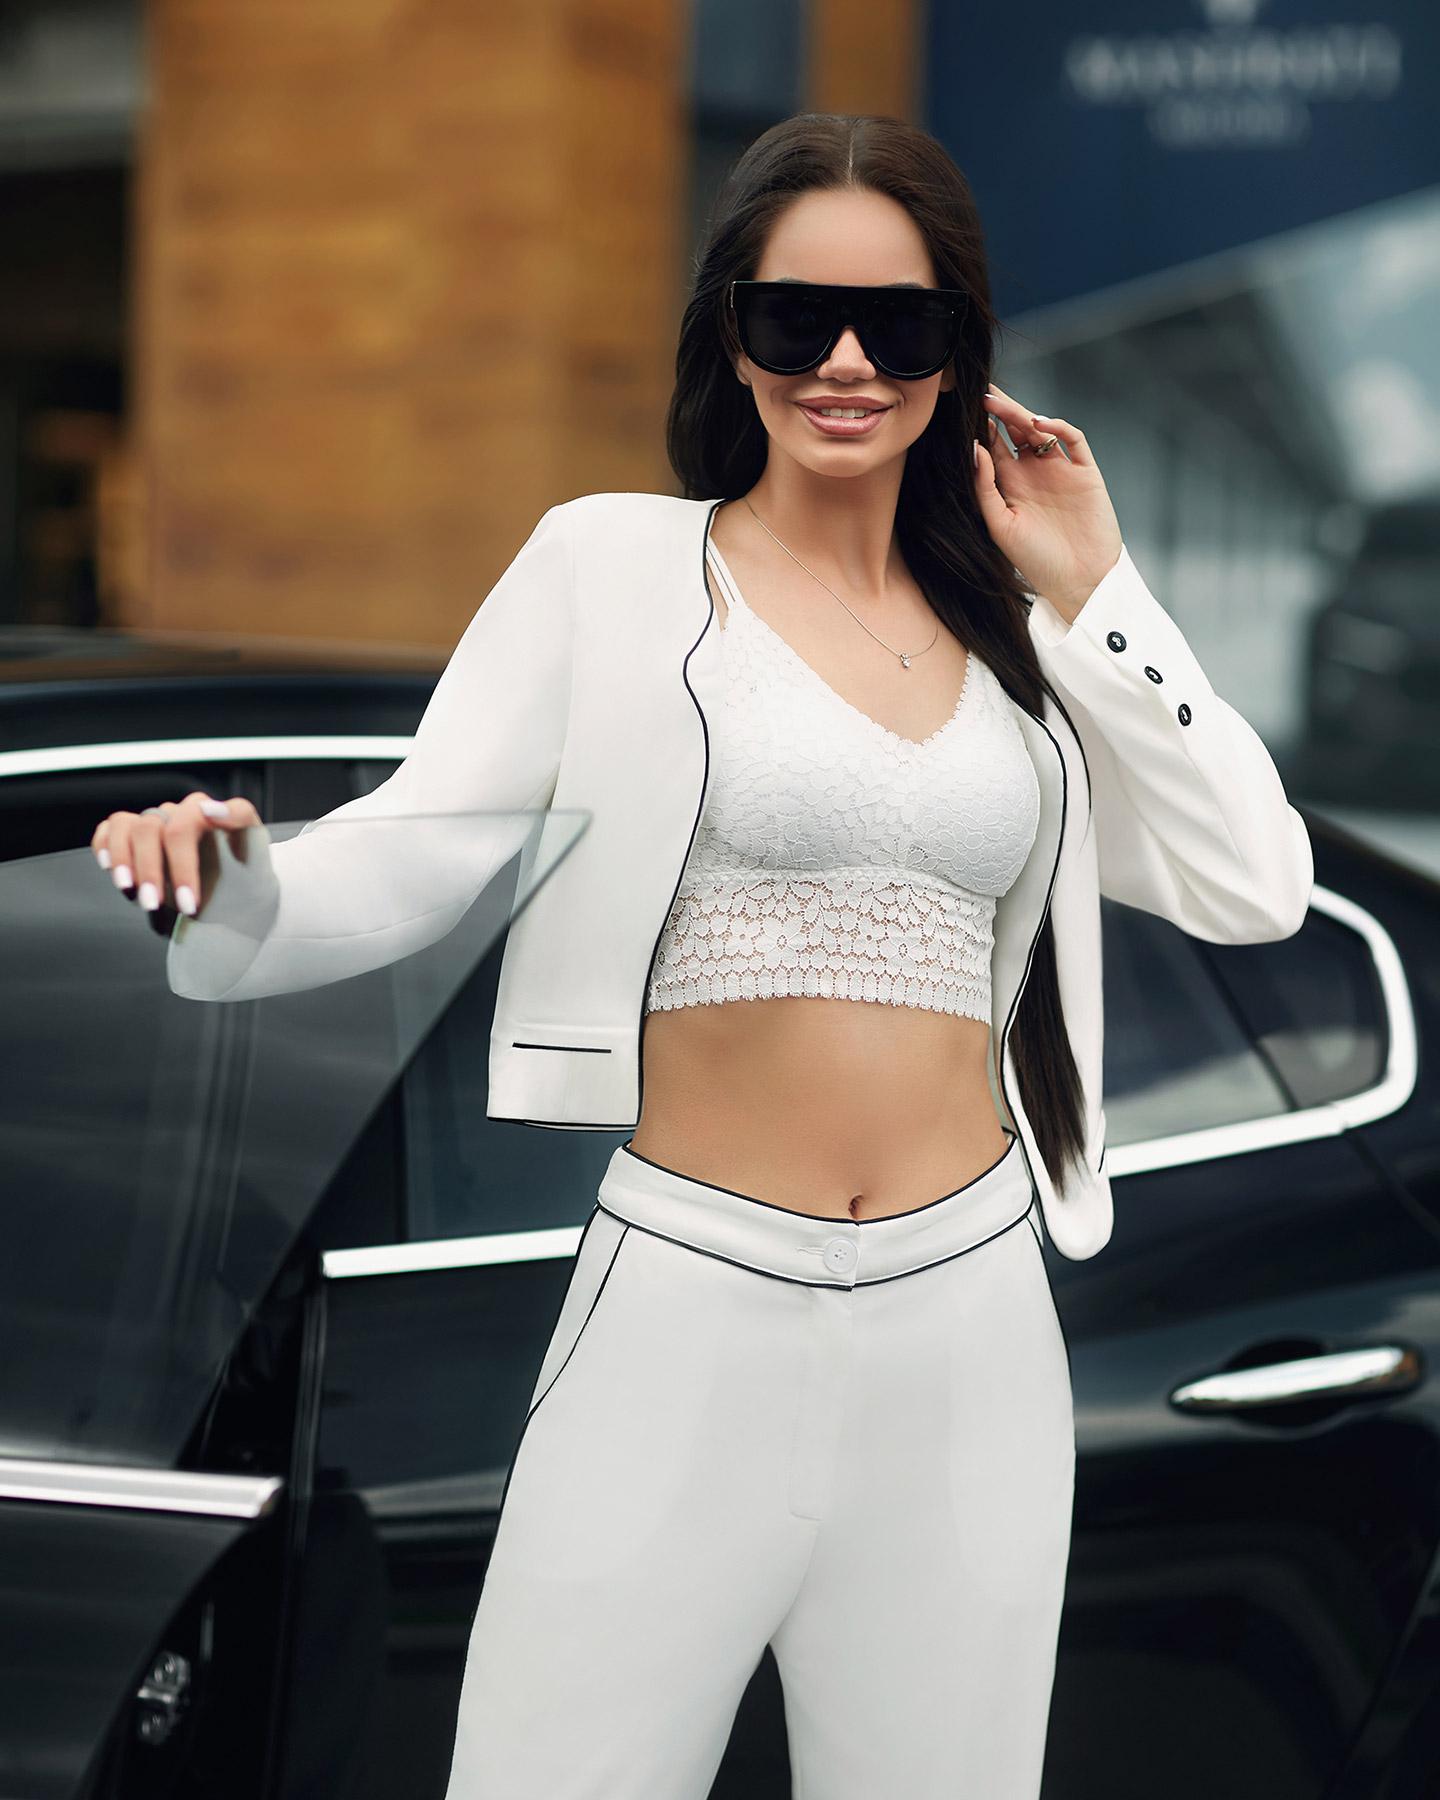 Фотосессия для бренда одежды JJ Wear в Барвиха Luxury Village